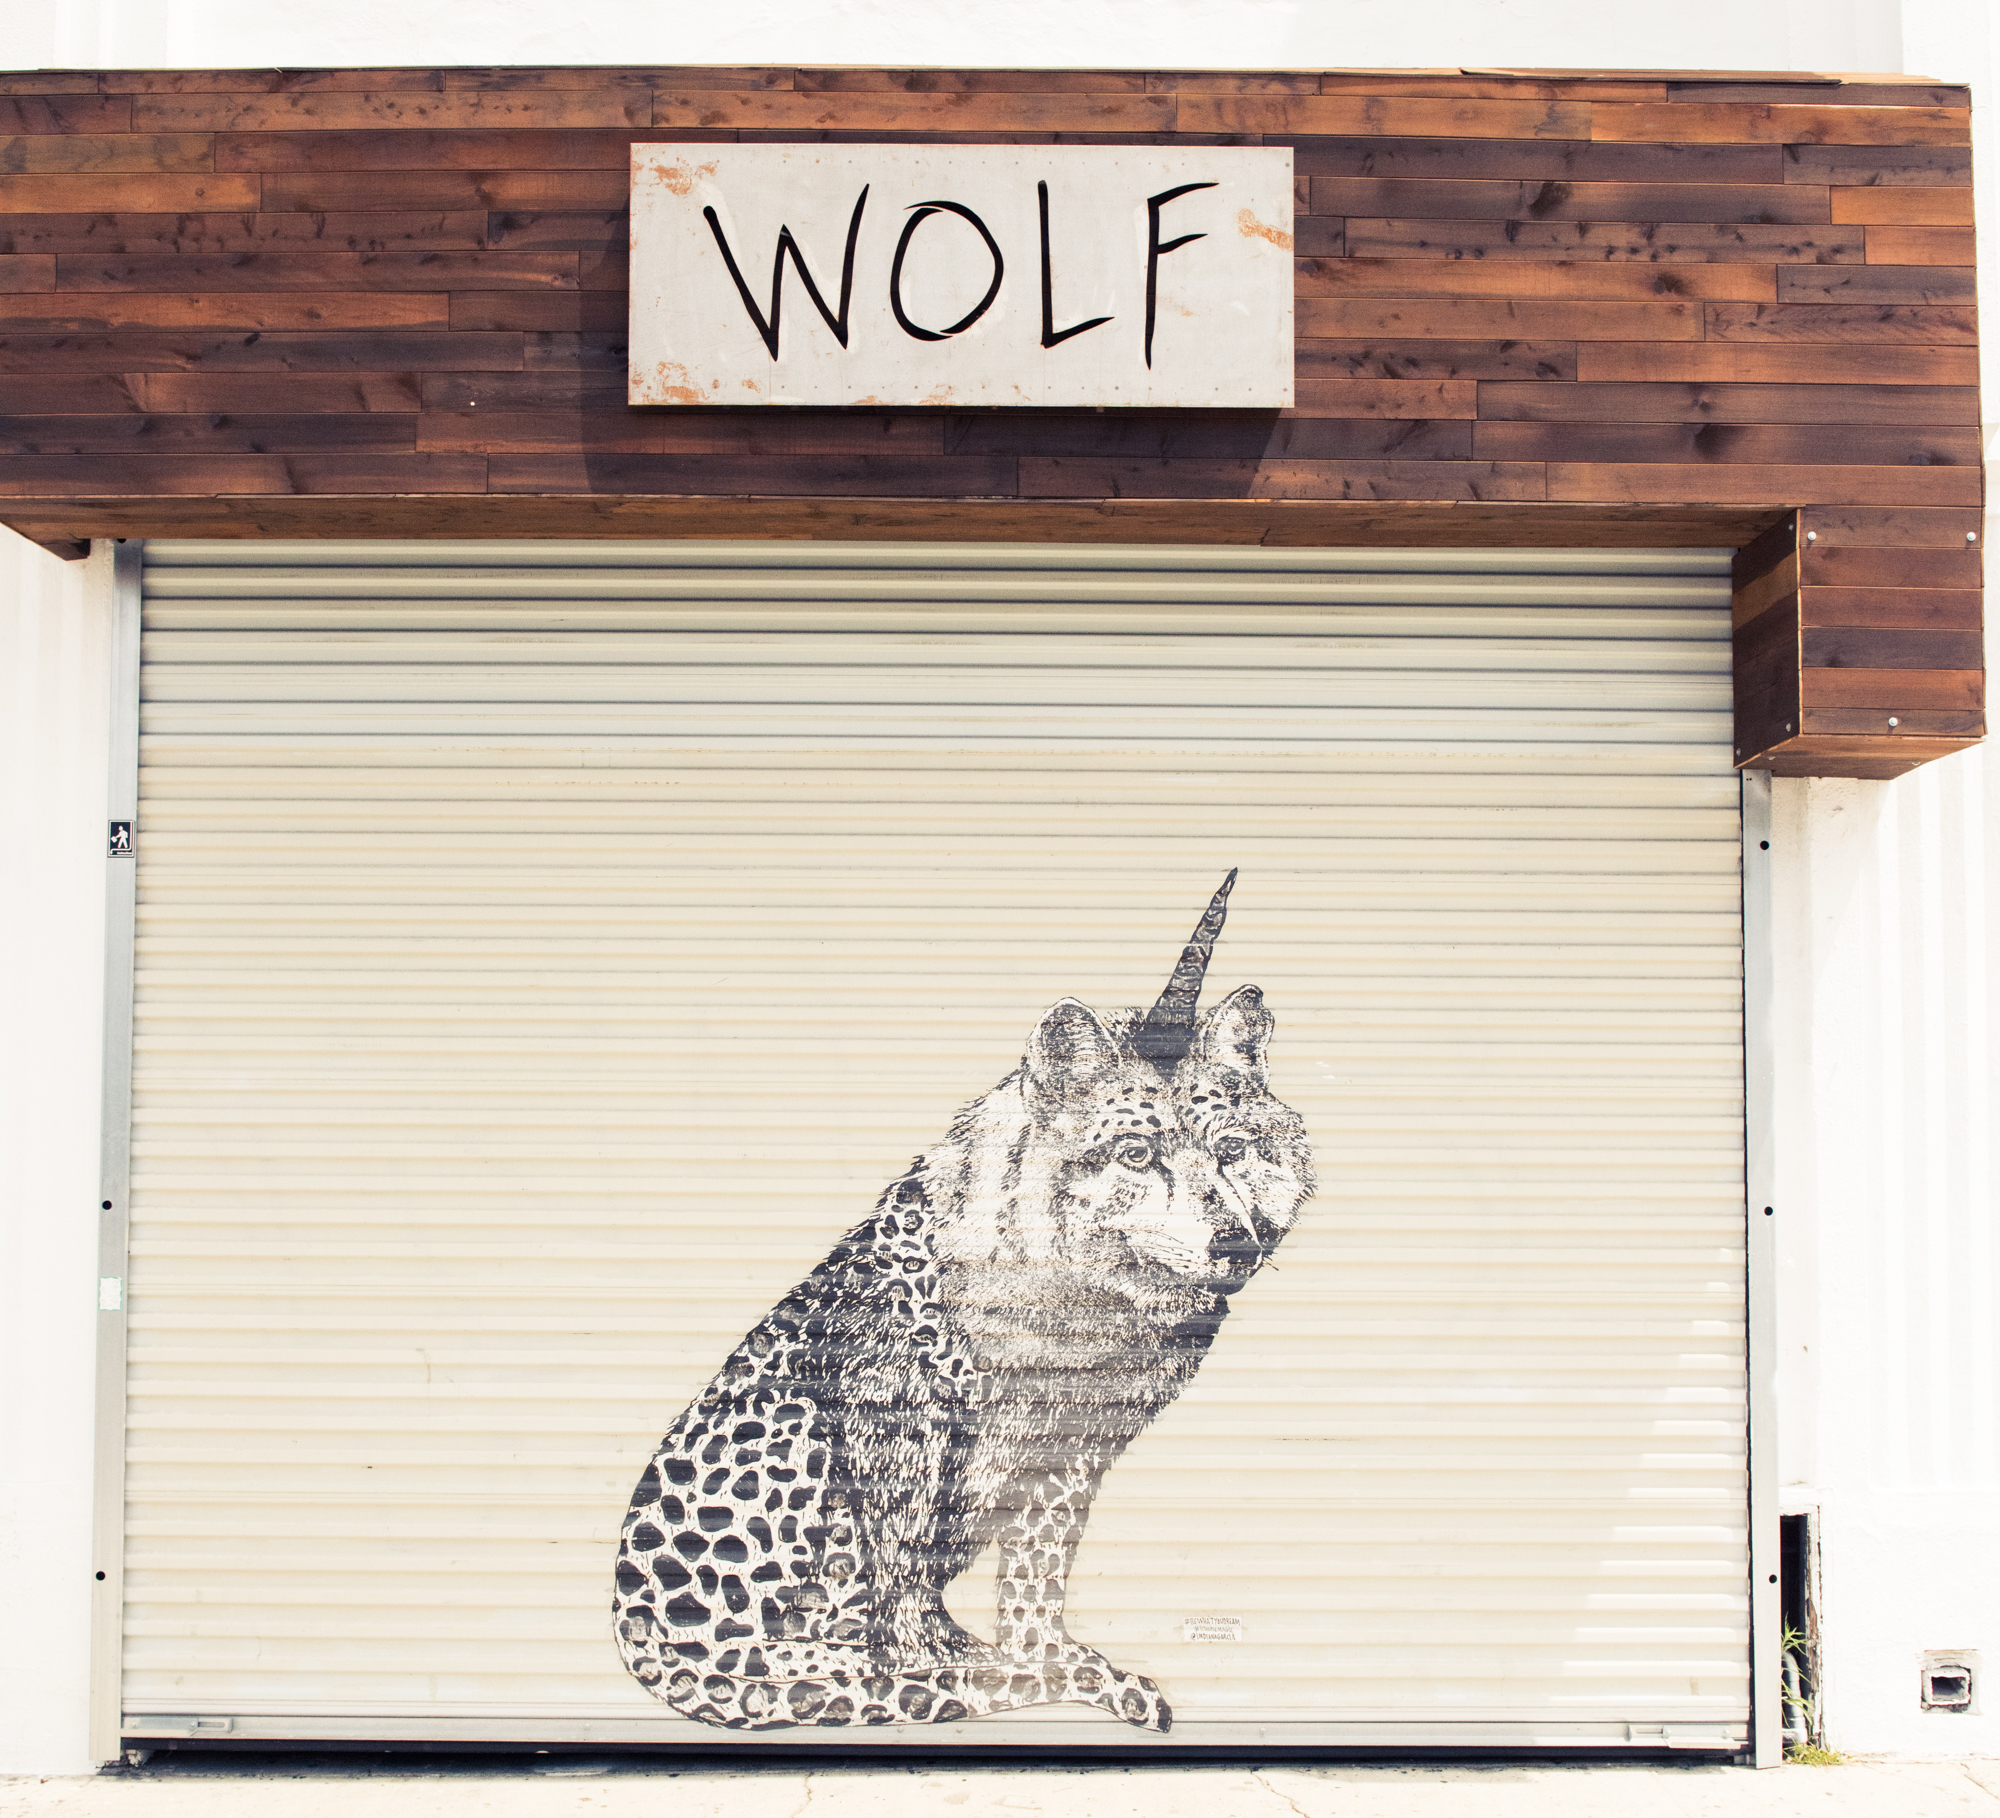 WOLF_Marcel_Vigneron-Jake Rosenberg-93 copy.jpg